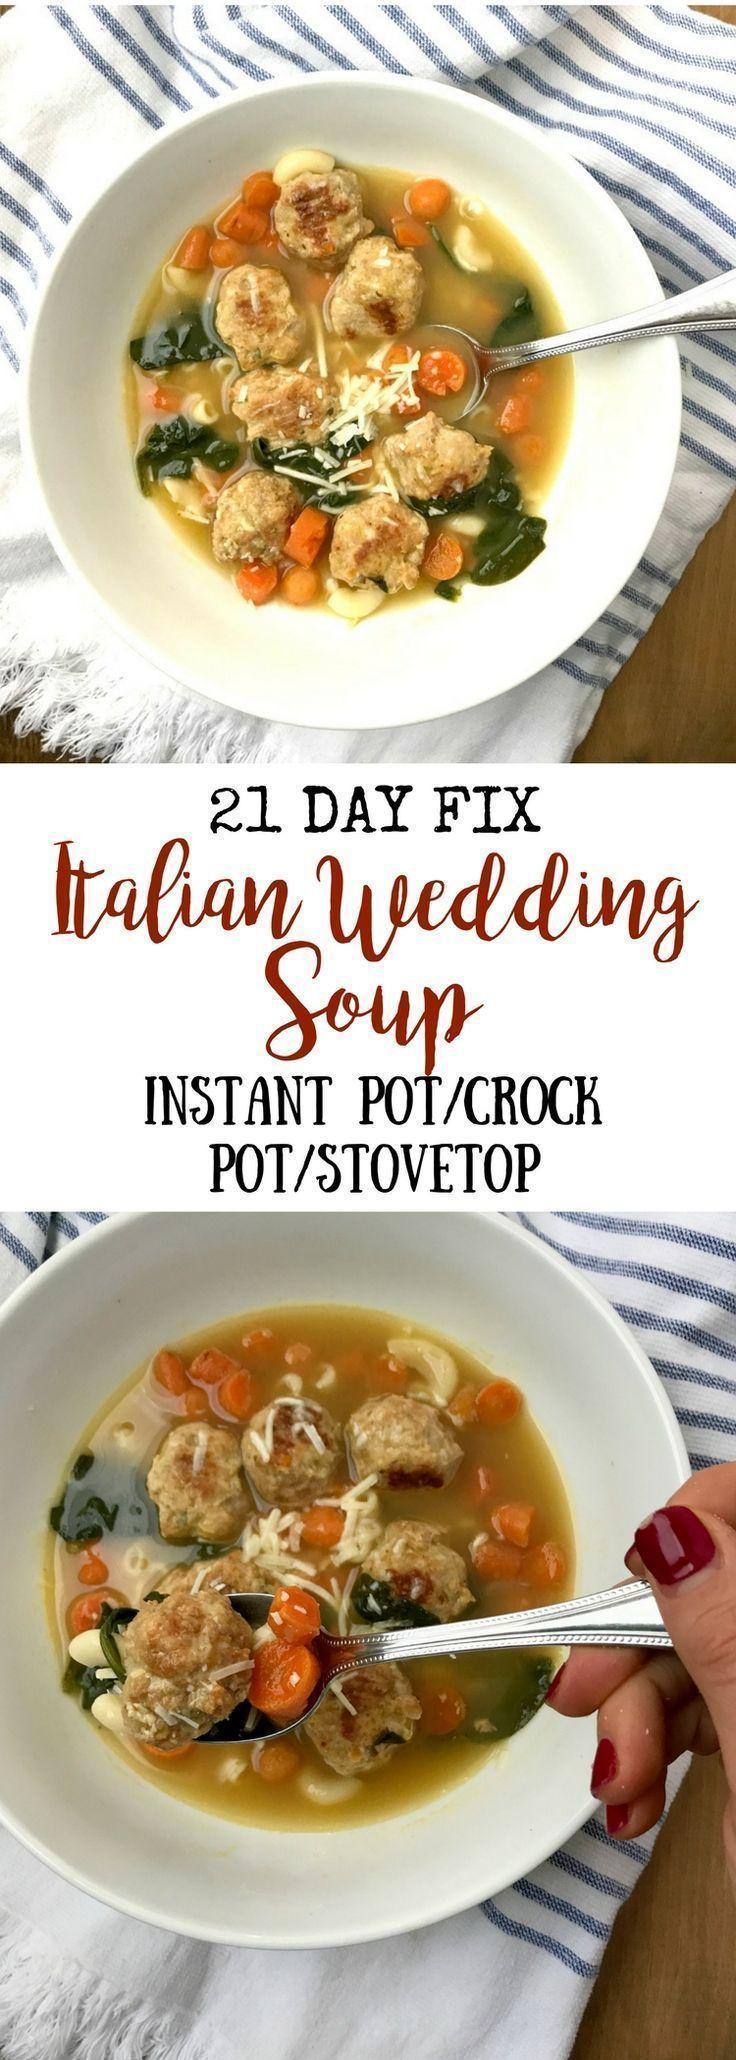 Italian Wedding Soup {21 Day Fix} Make 6 cups chicken